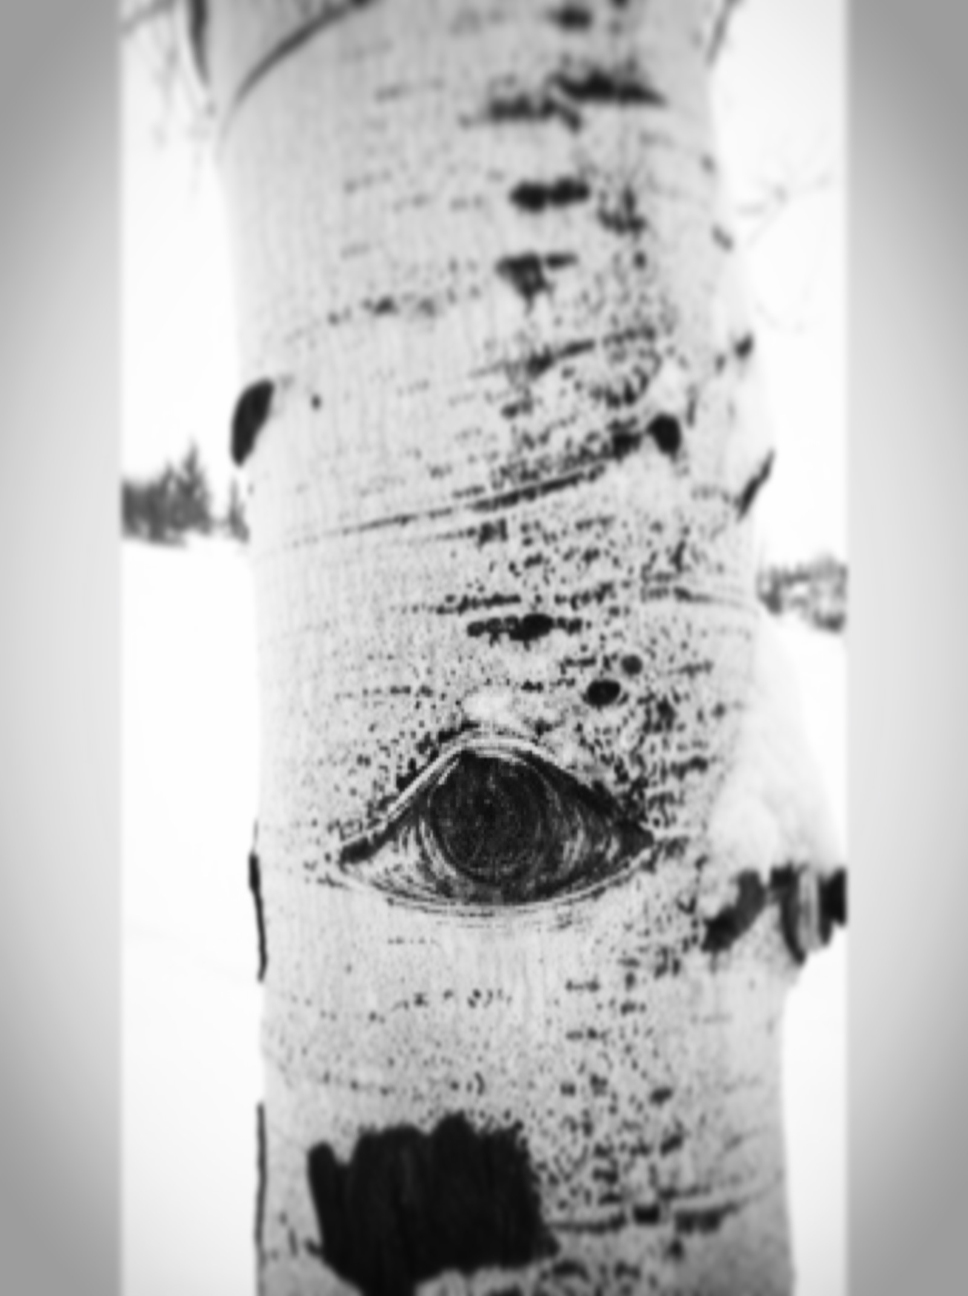 vail_eye.jpg